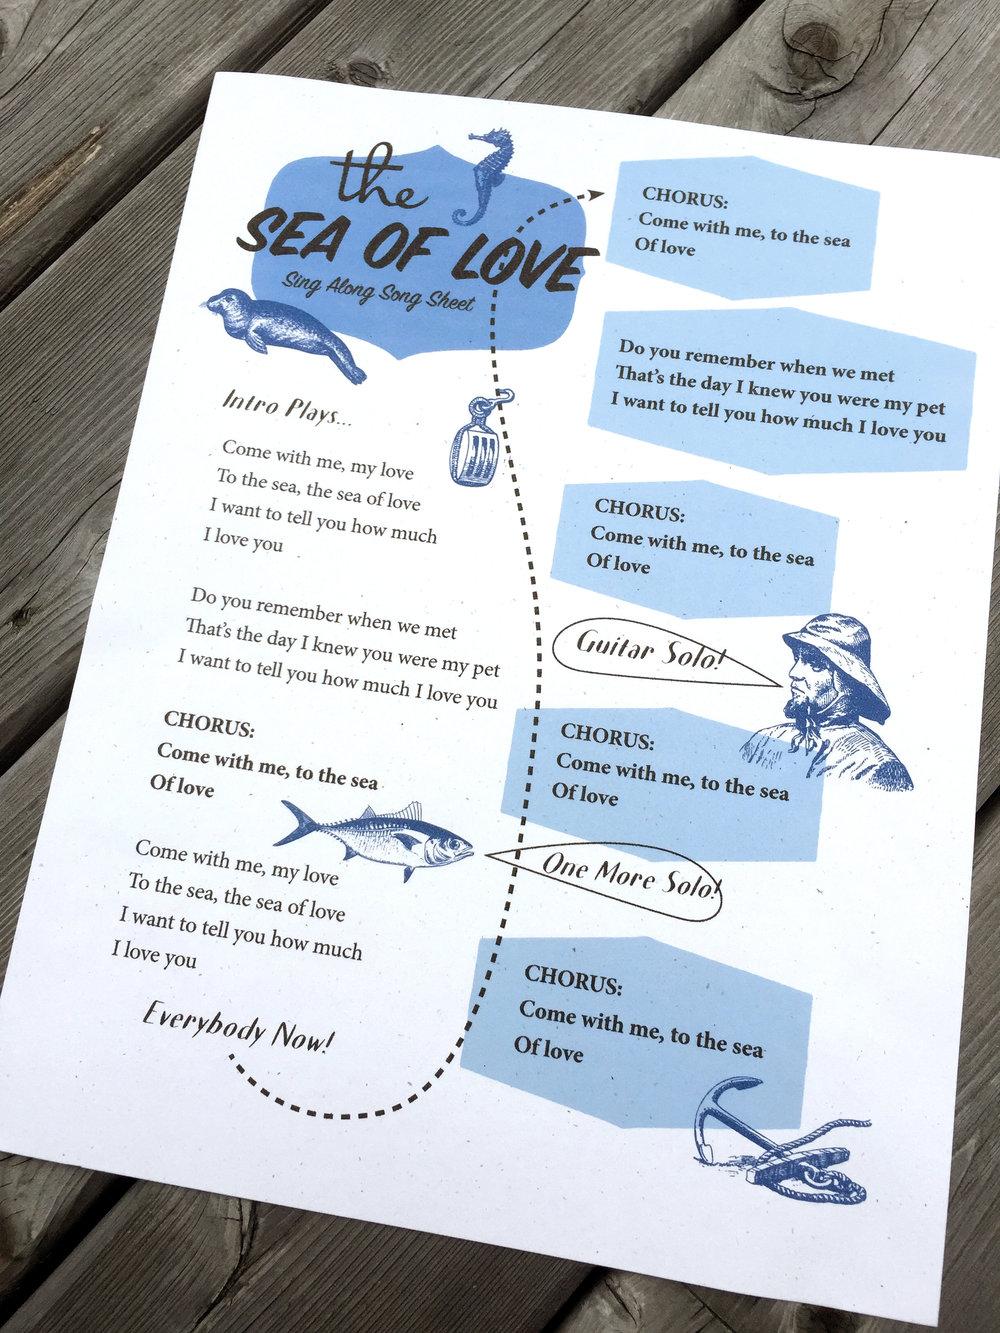 'Sea of Love' Song Sheet